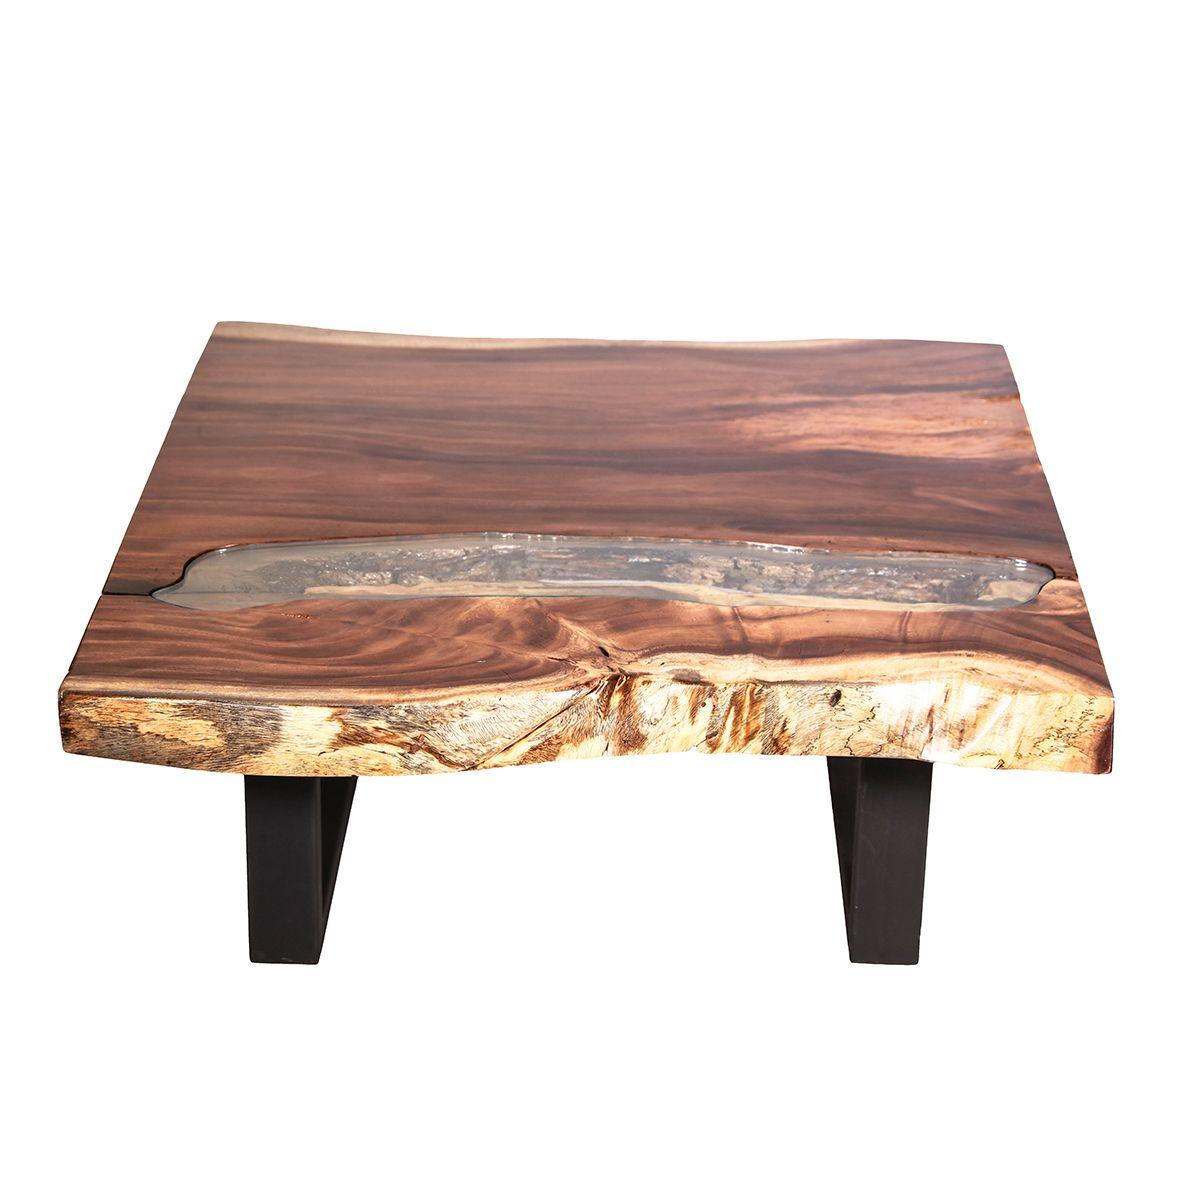 Live Edge Coffee Table With Glass Liveedge Custom Unique Coffee Table Table Live Edge Coffee Table [ 1200 x 1200 Pixel ]